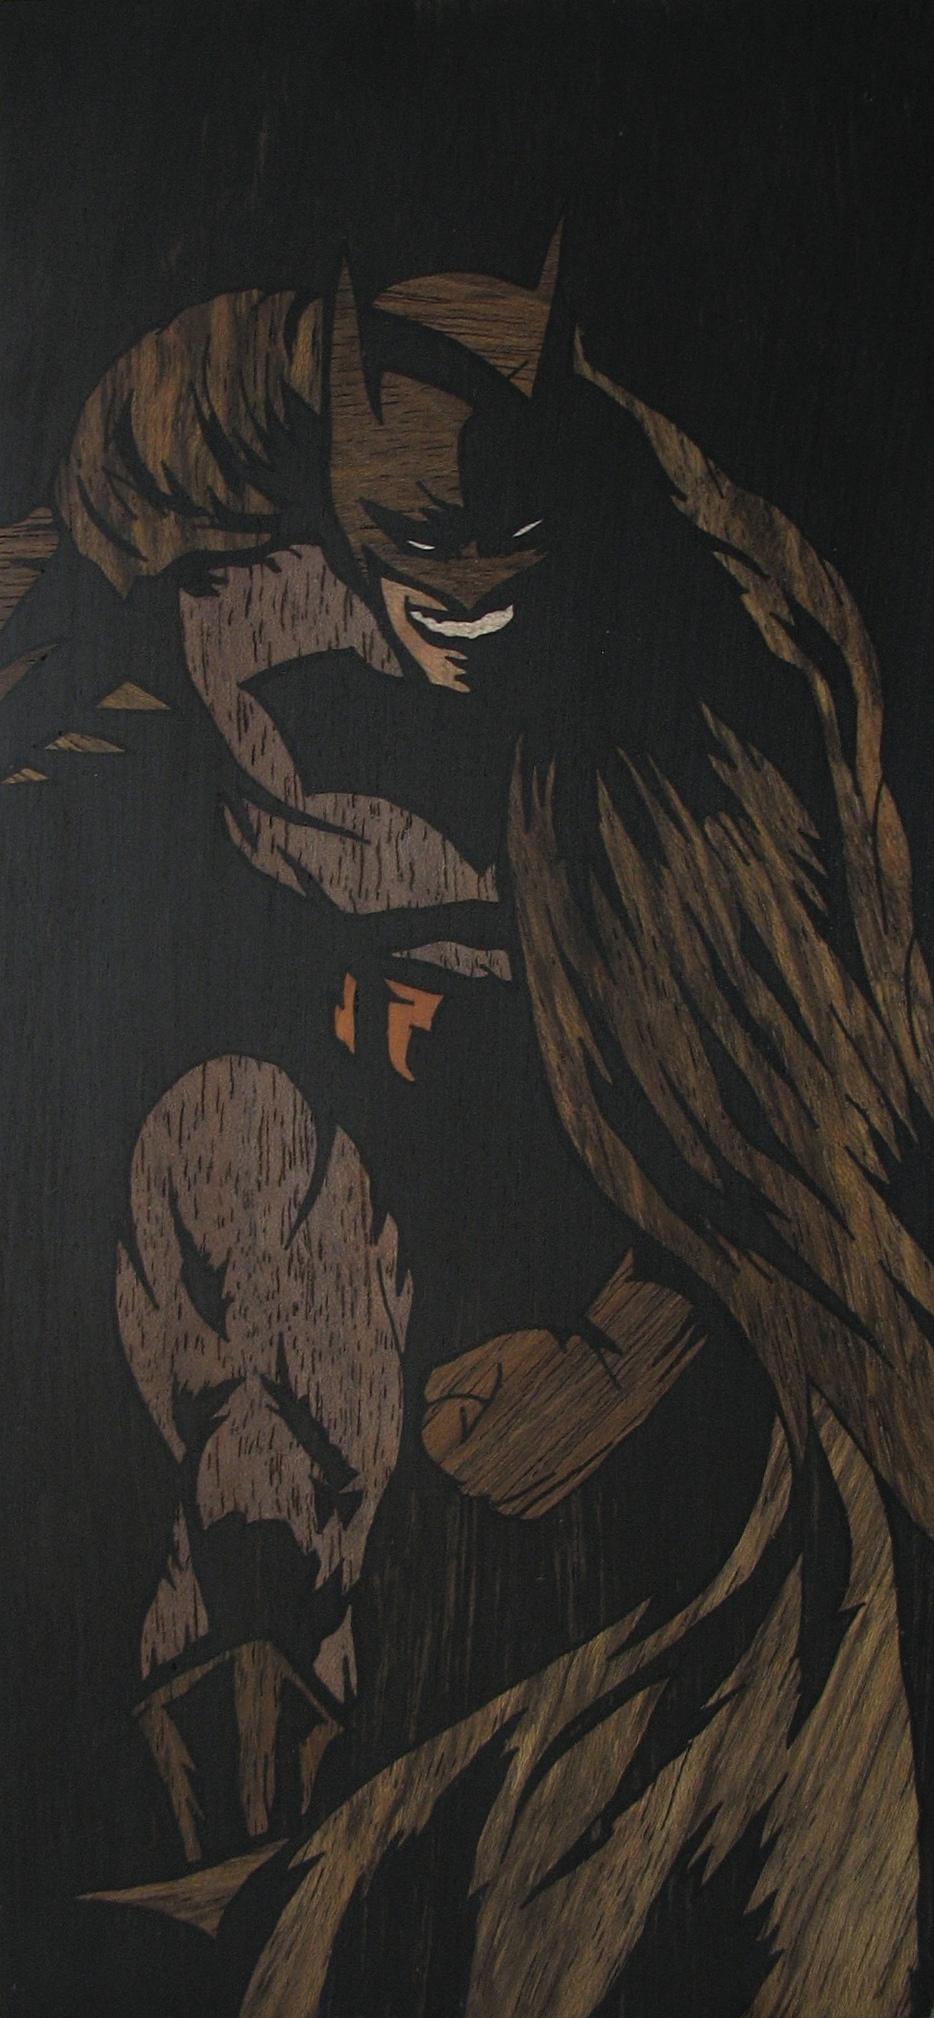 BATMAN 2 INLAY